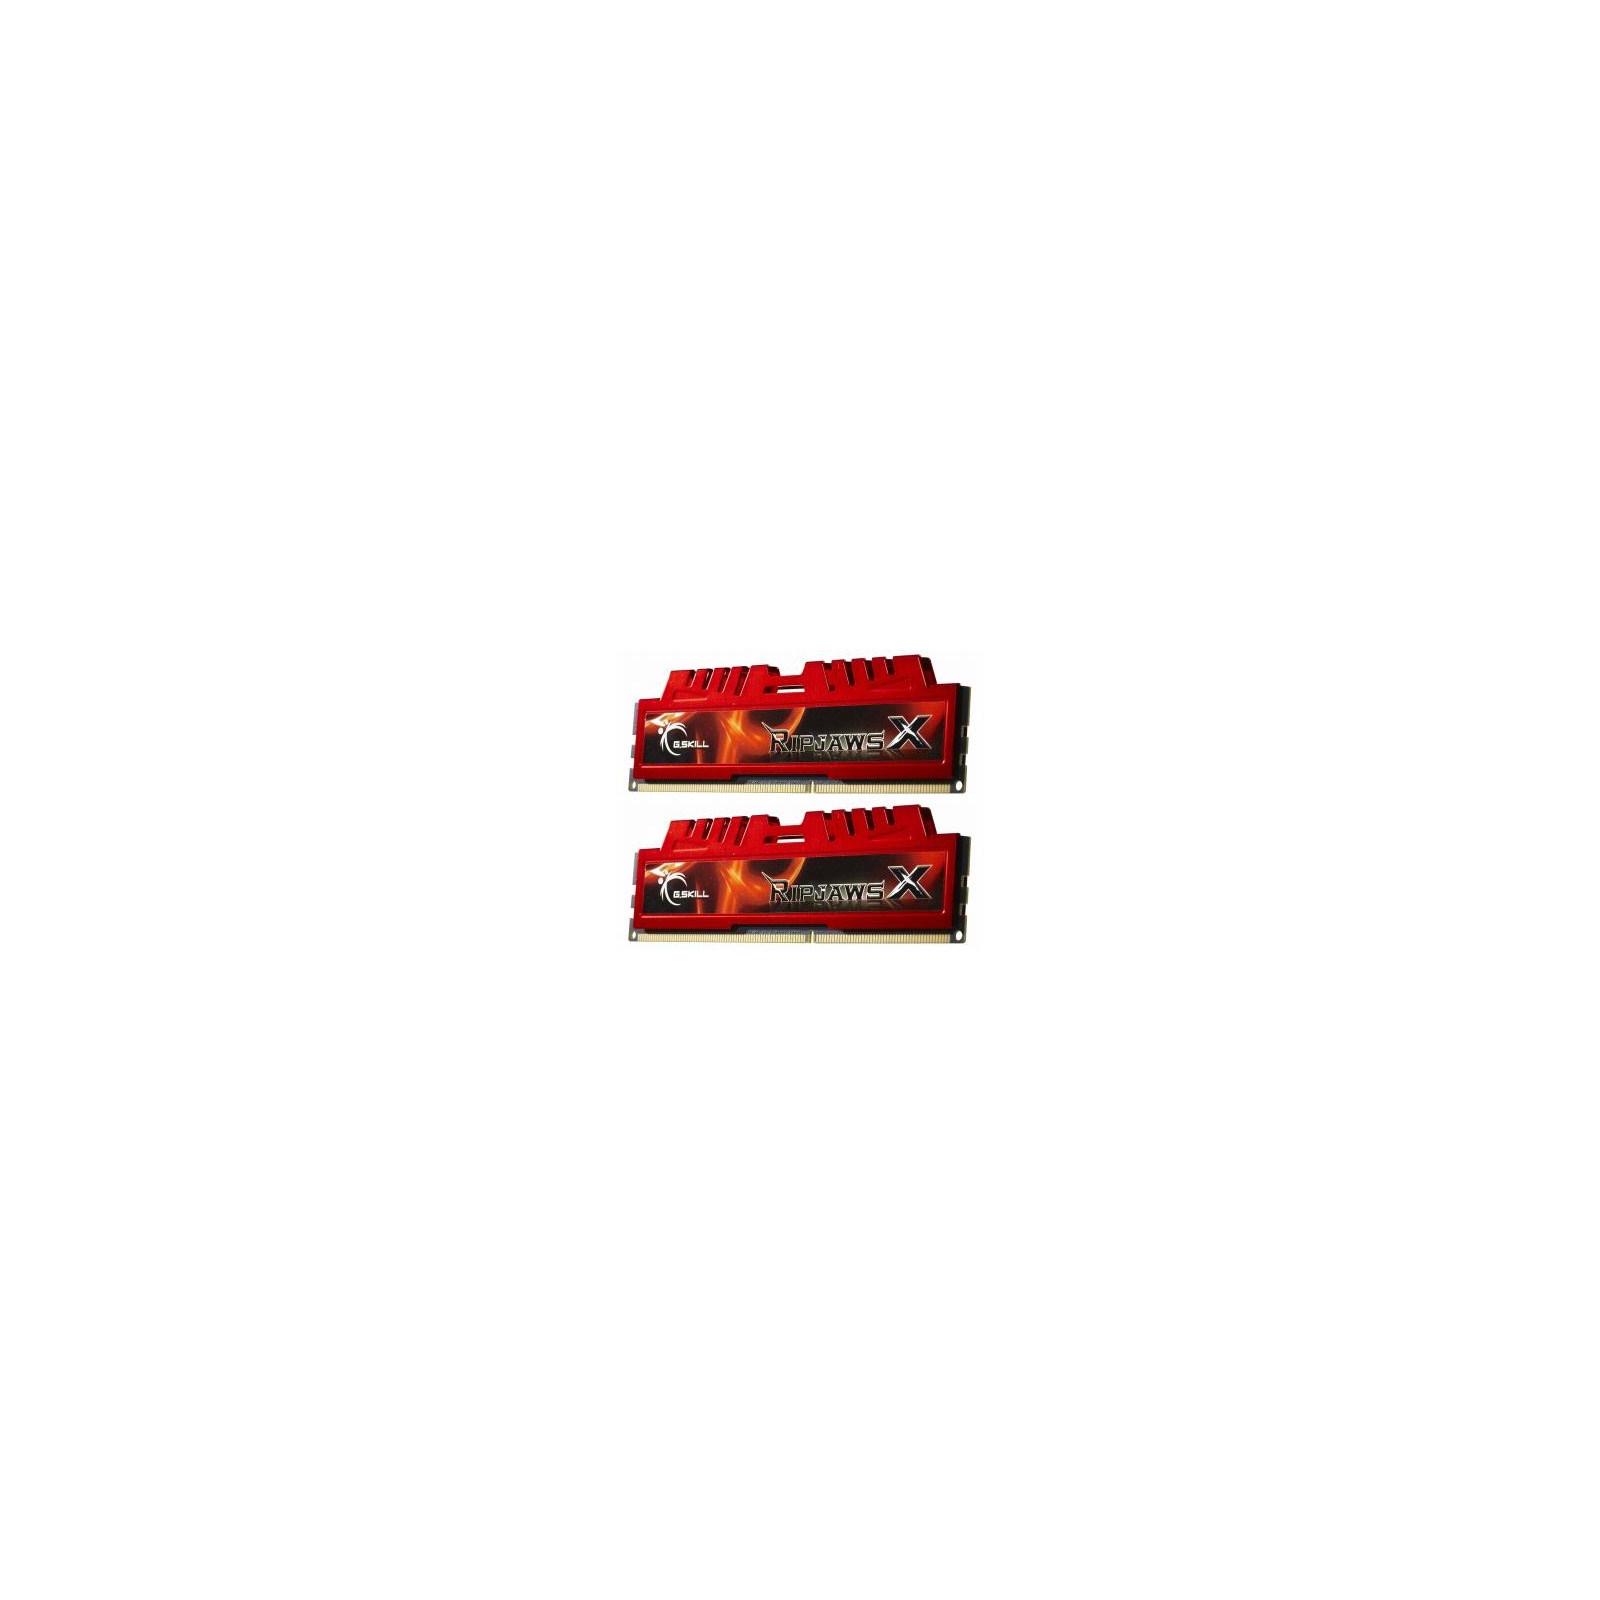 Модуль памяти для компьютера DDR3 16GB (2x8GB) 1600 MHz G.Skill (F3-12800CL10D-16GBXL)